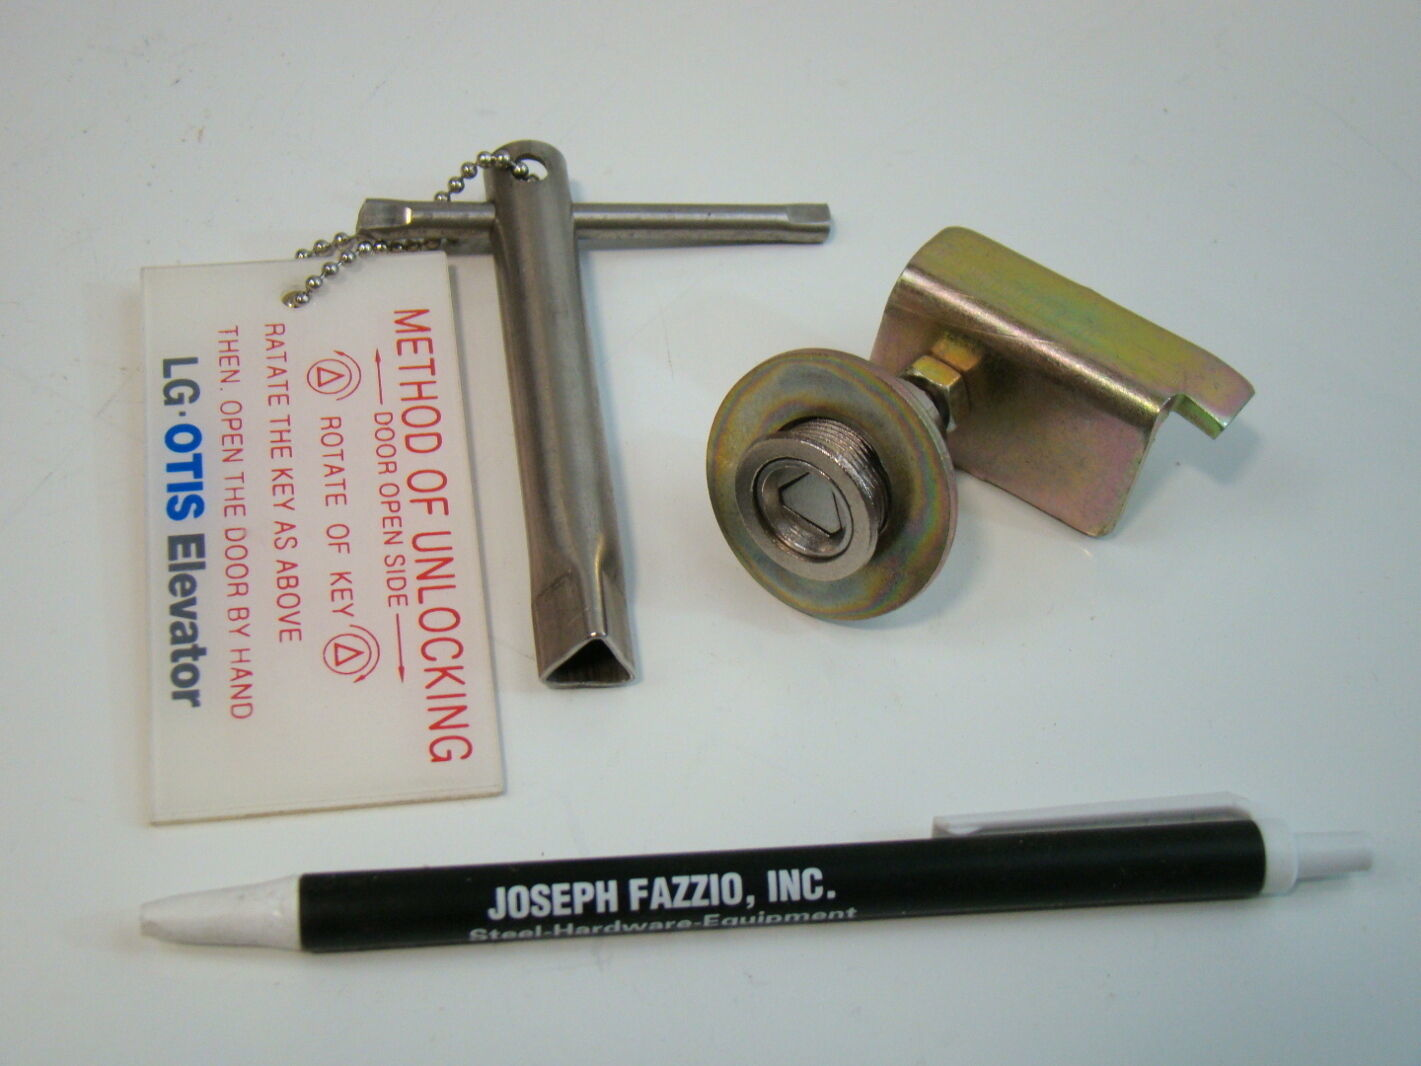 LG Otis Elevator Triangular Door Lock & Key eBay #7D564E